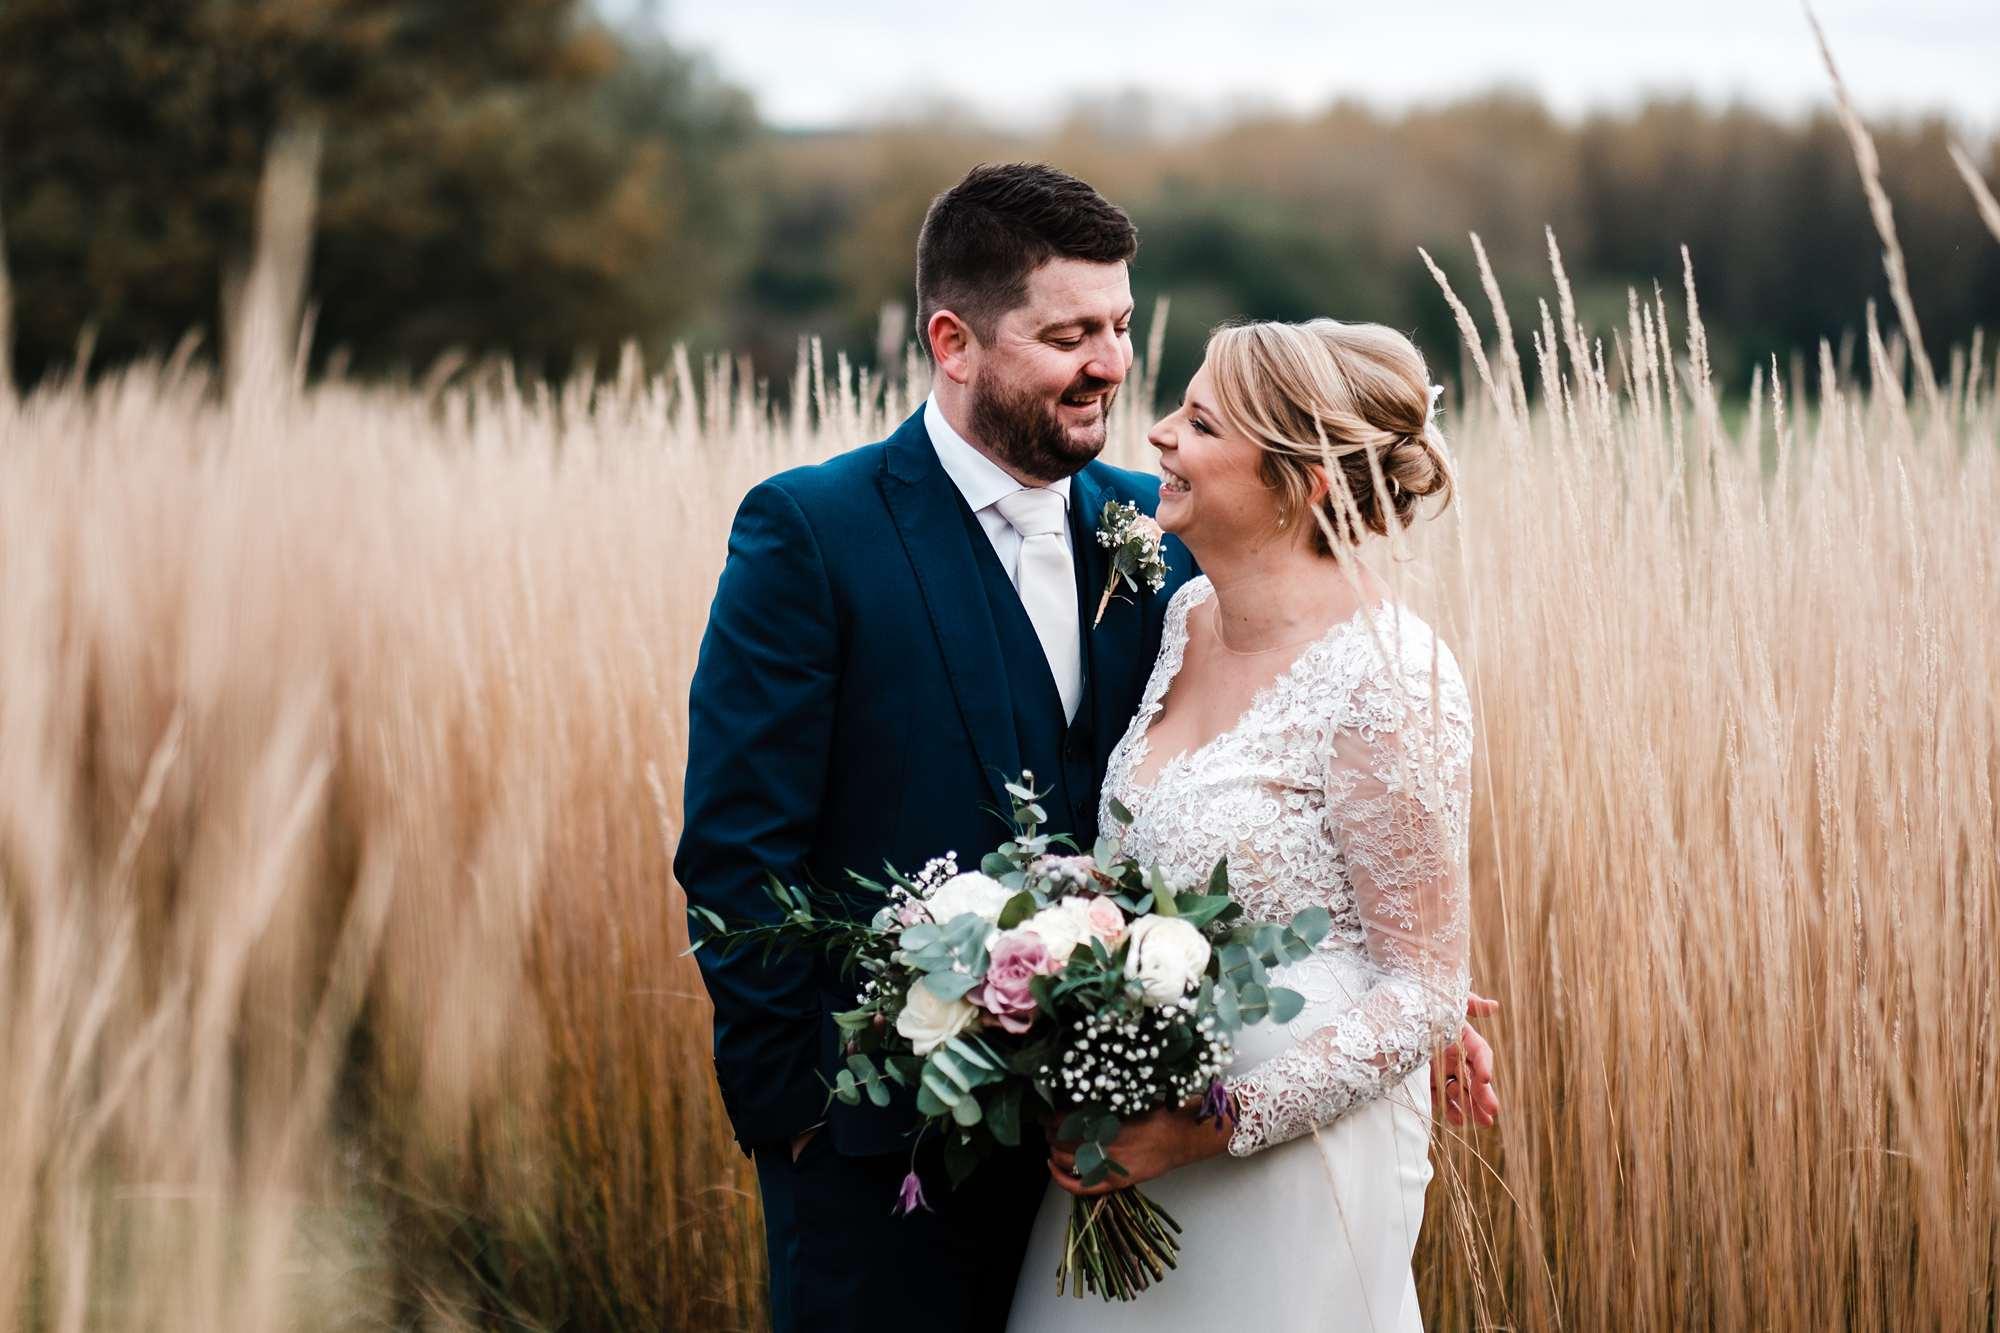 Bury Court Barn wedding in Hampshire